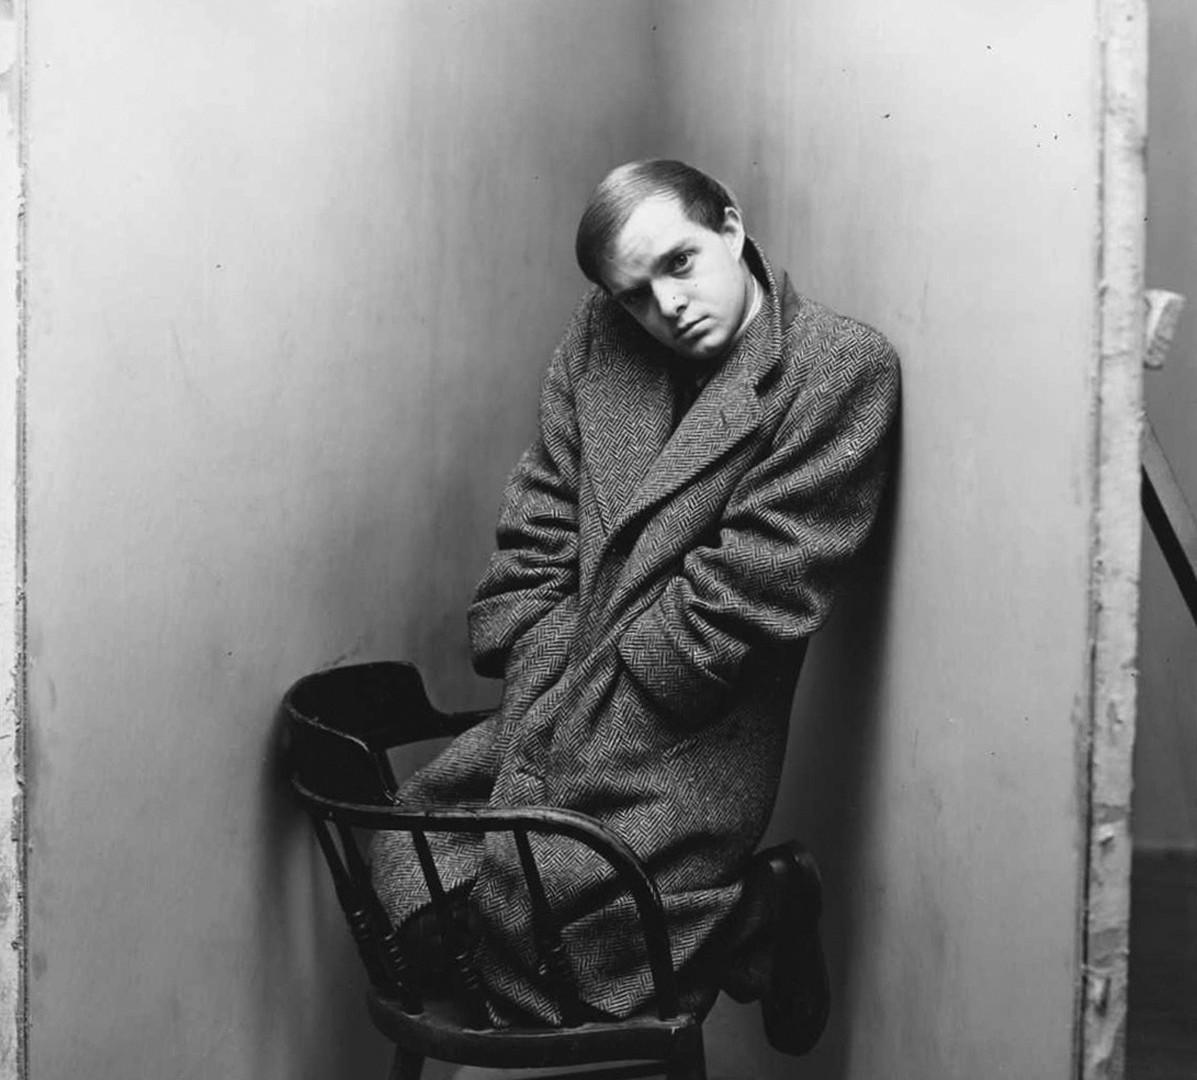 Irving Penn, Truman Capote, New York, 1948